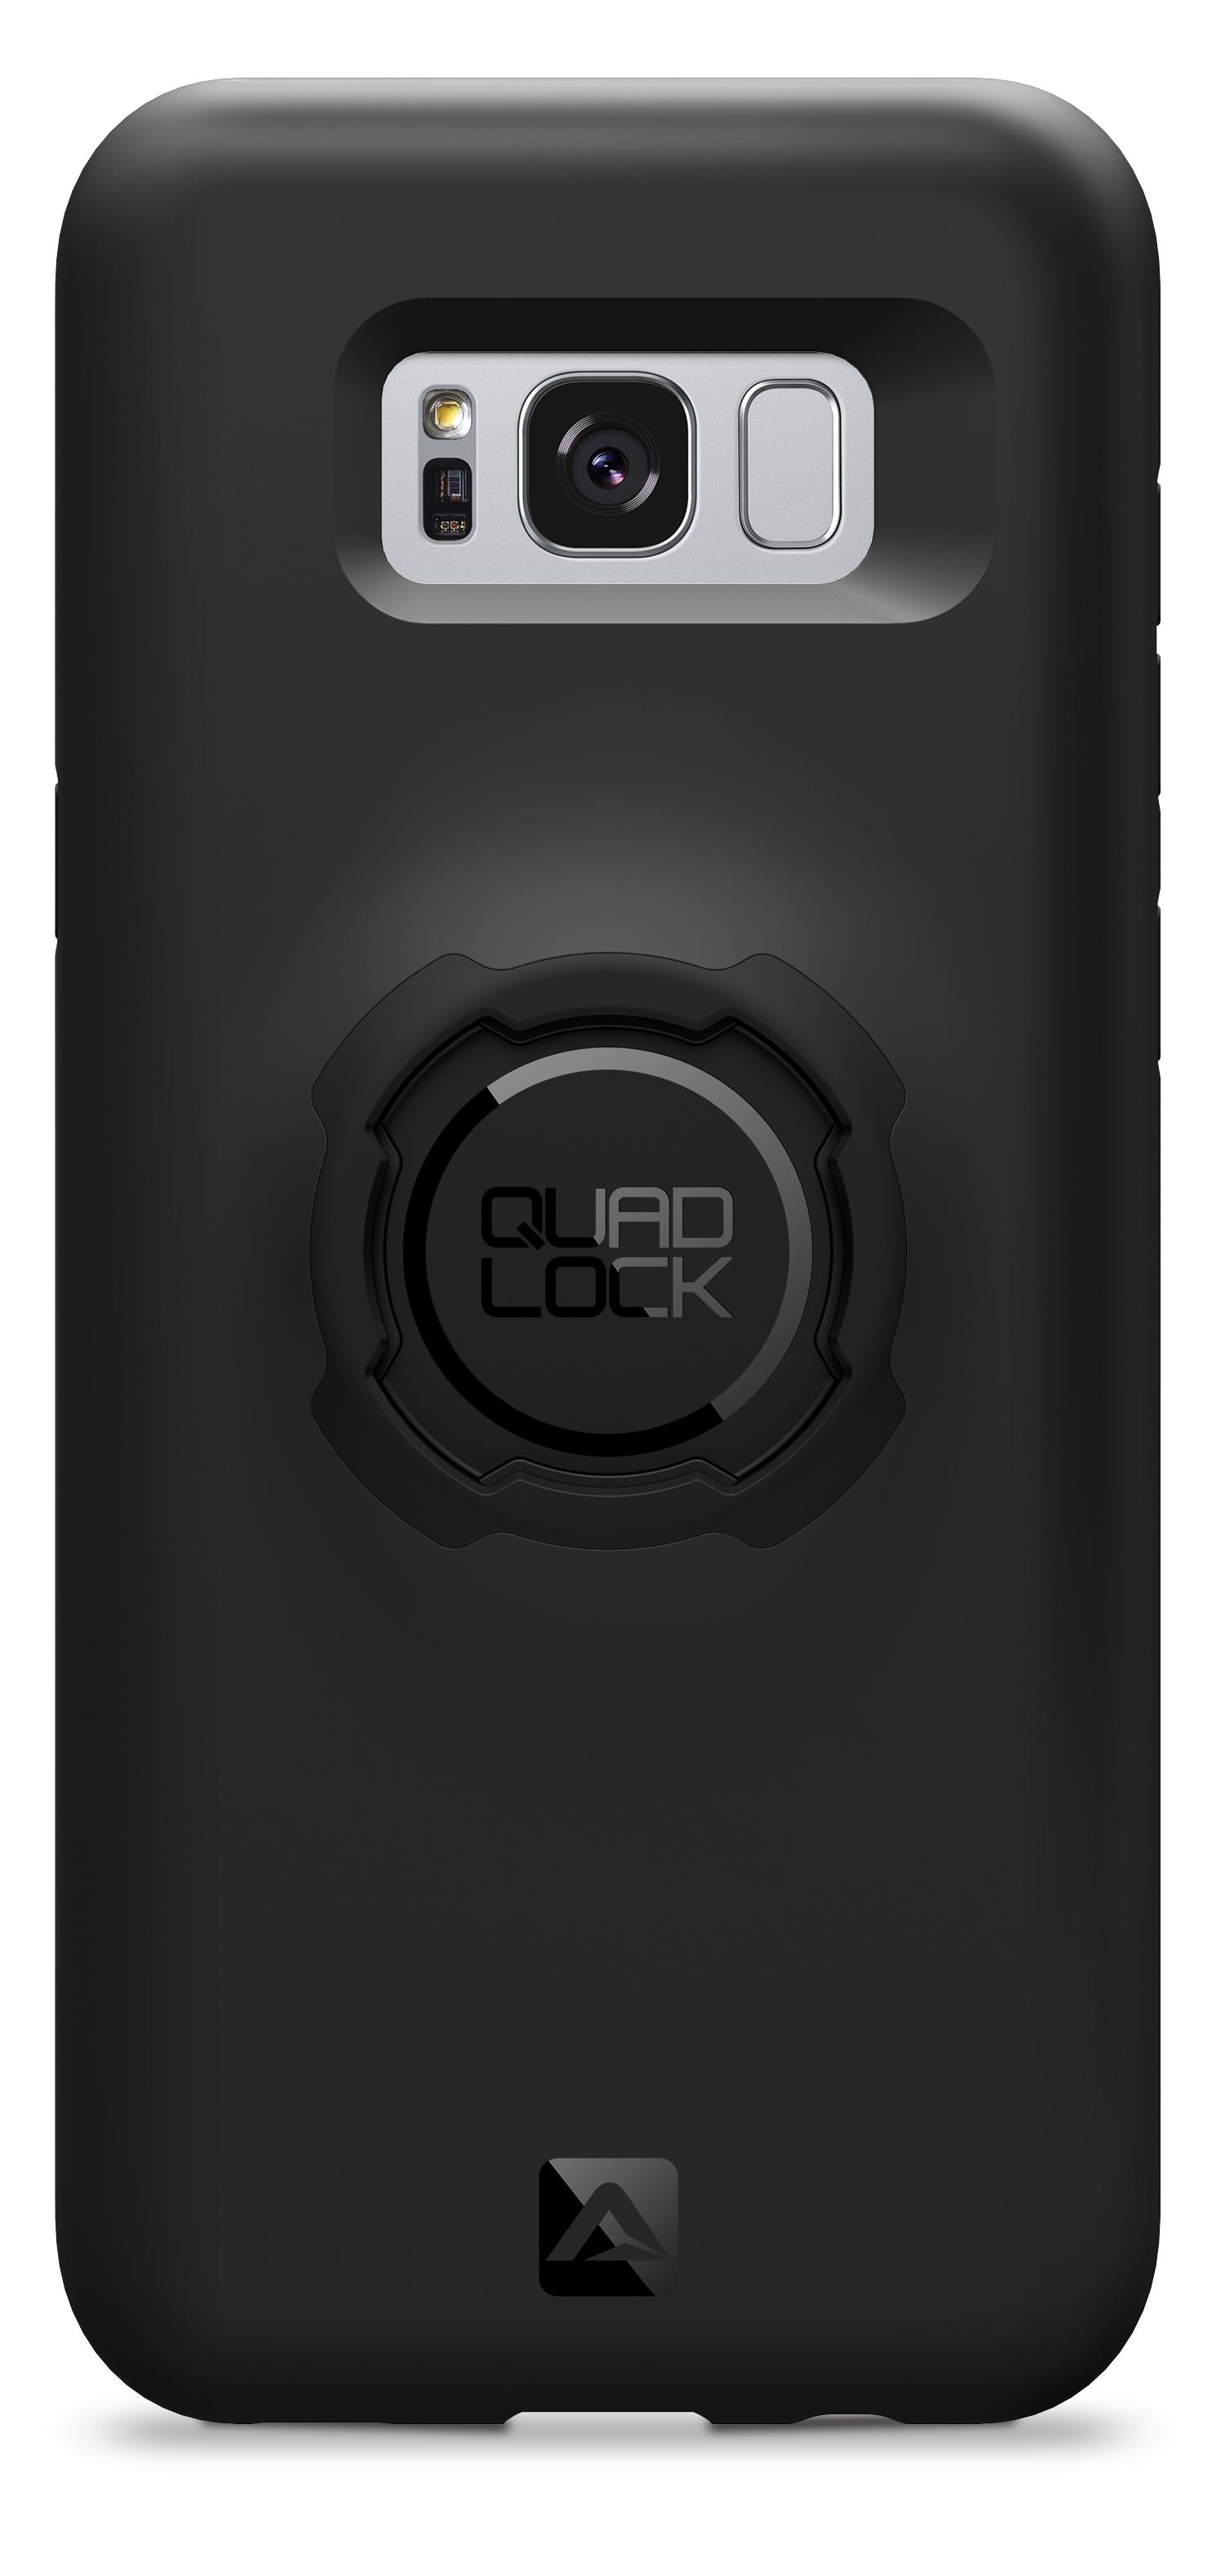 Quad Lock - Cover - Til Samsung S7 | Travel bags